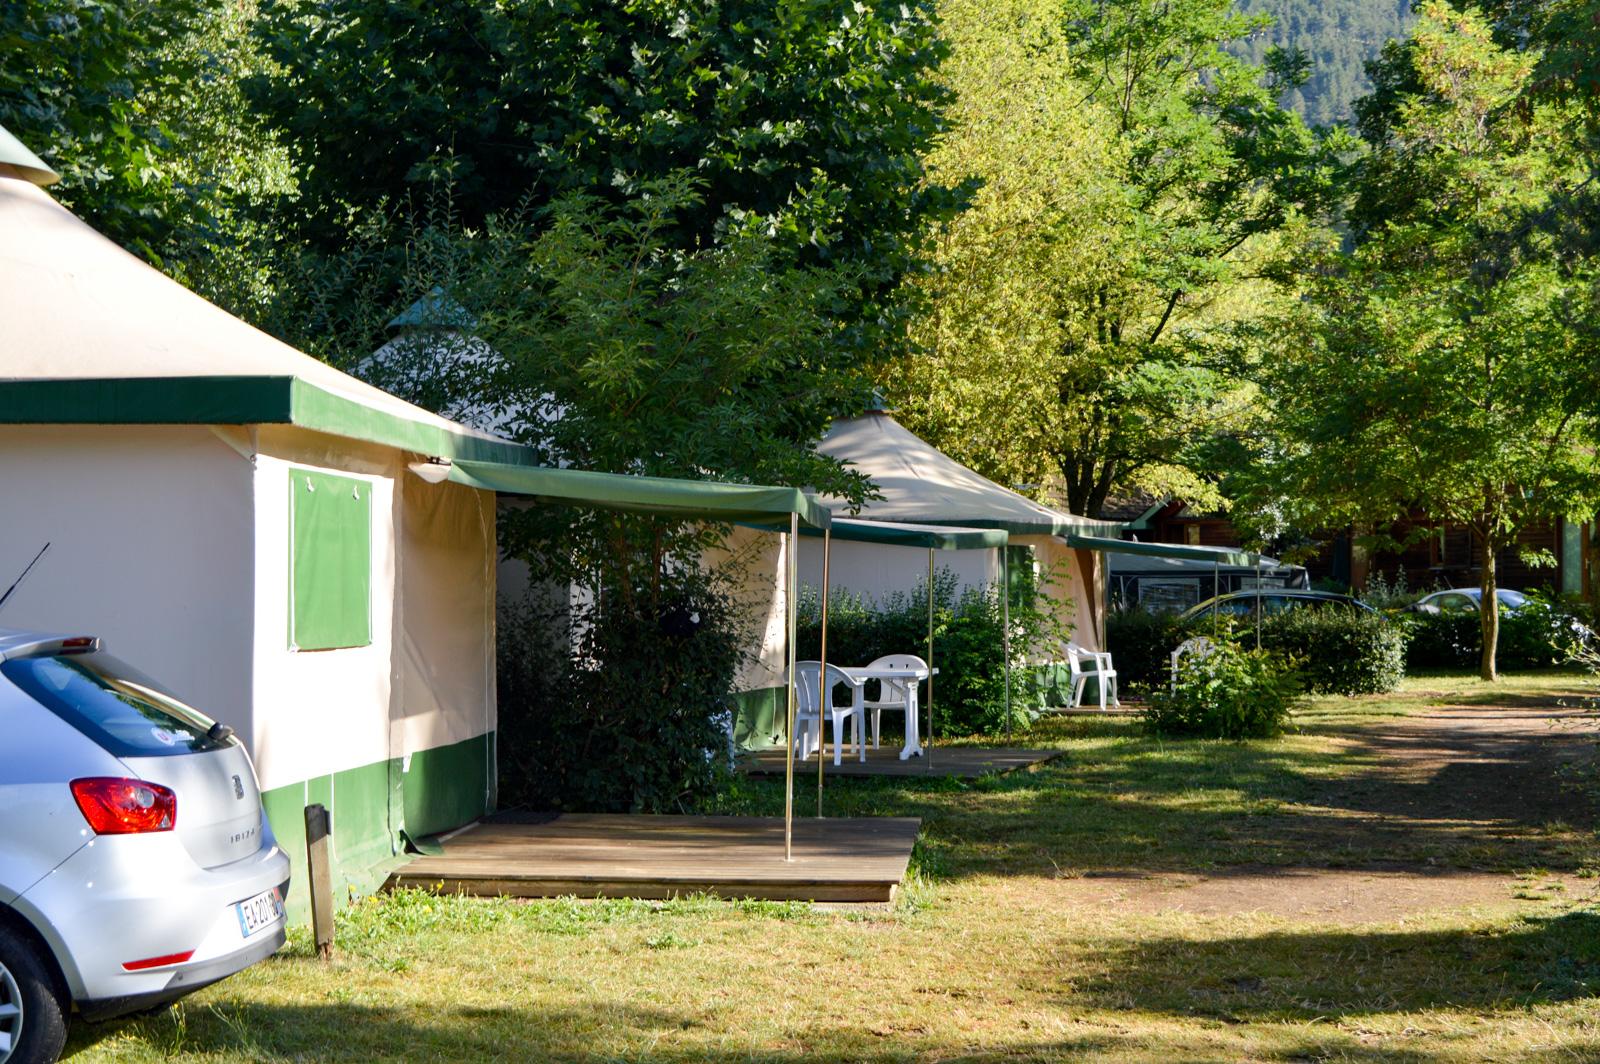 Our rentals : chalets and Bengali tents - Camping du Pré Morjal